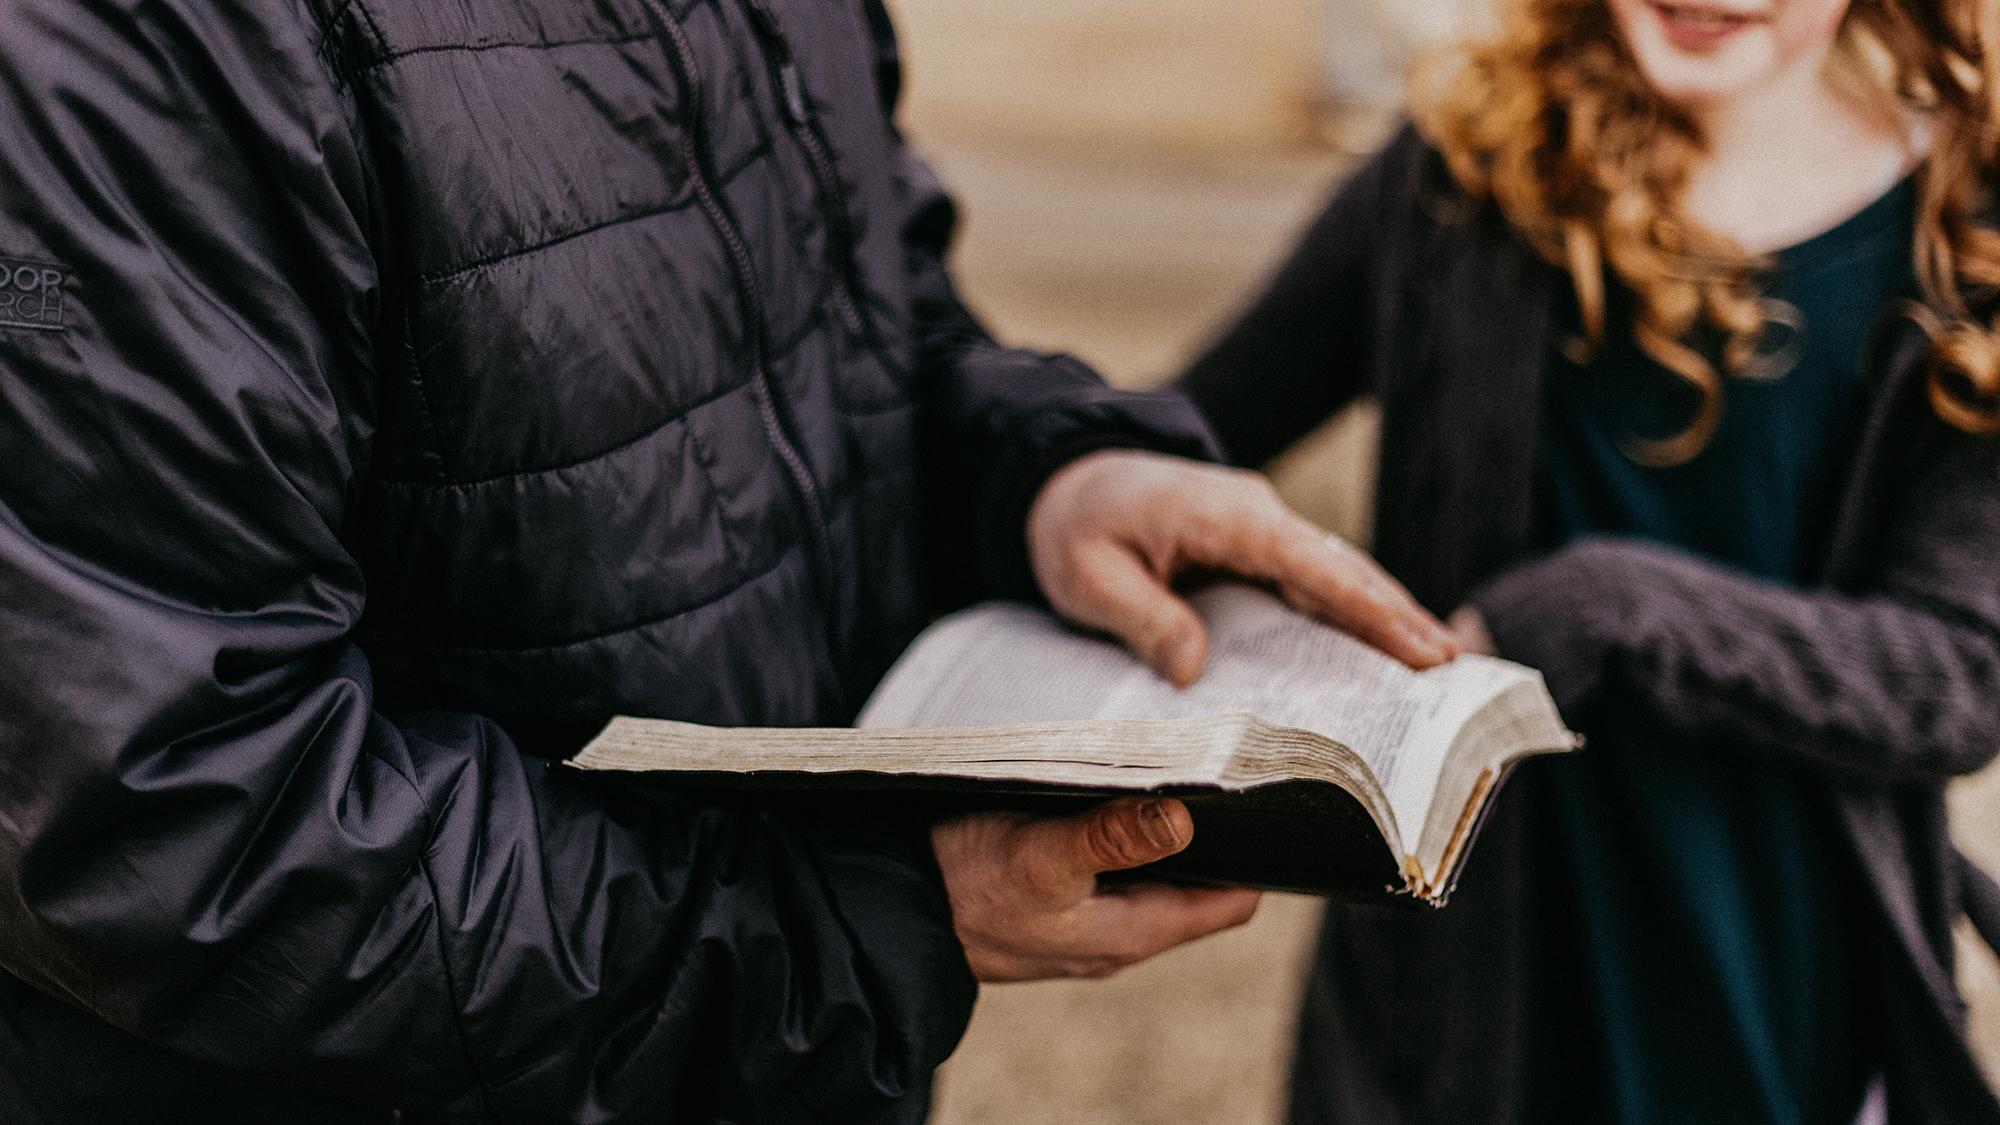 The Five S's of Effective Evangelization